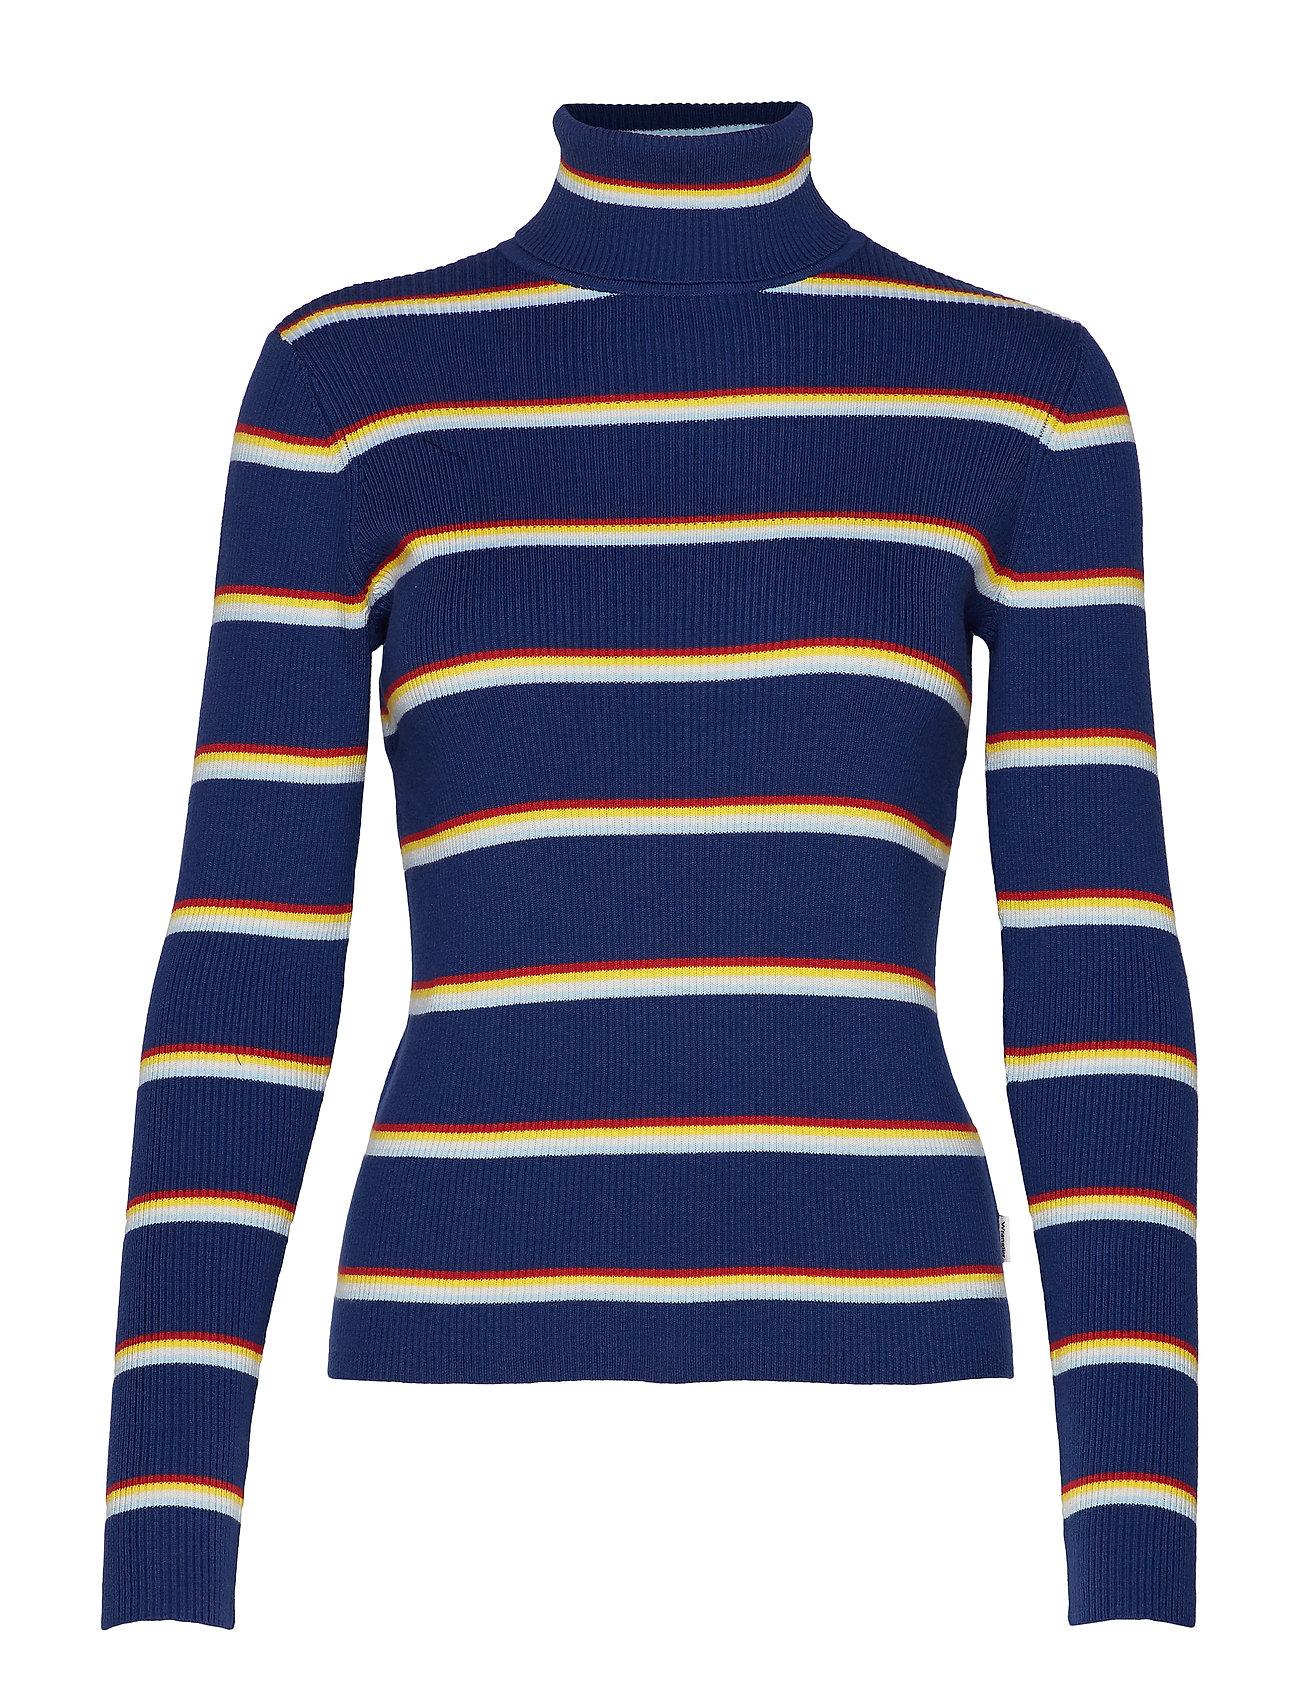 Wrangler TURTLE NECK - BLUE DEPTHS